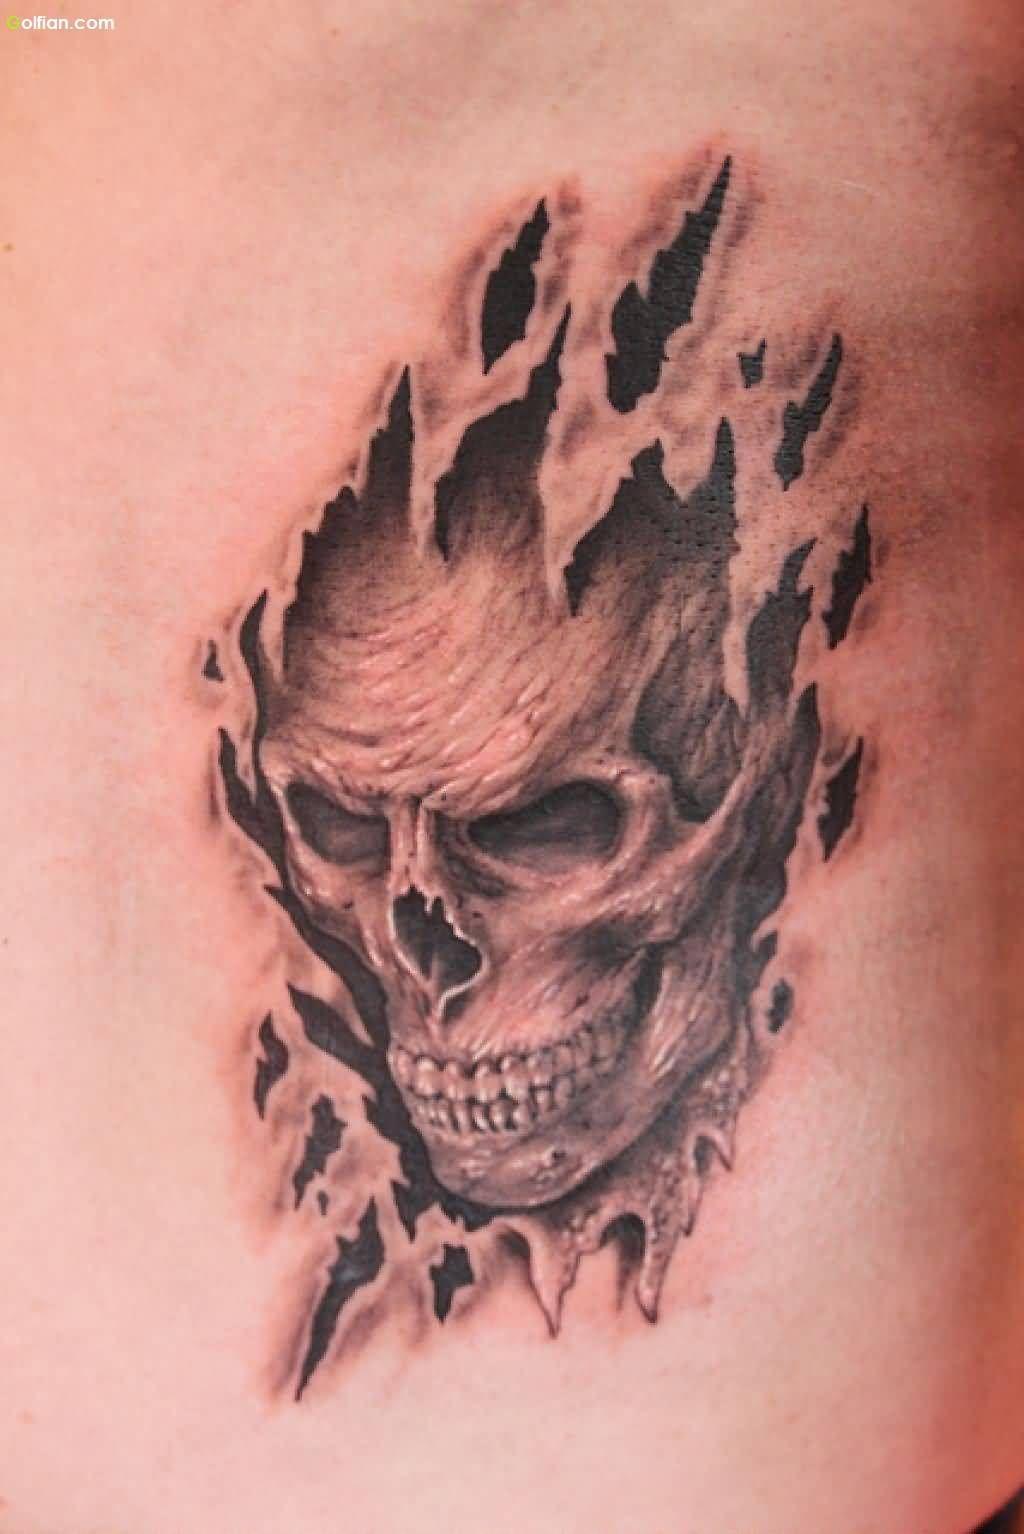 896011e08 Most Amazing 3d Ripped Skin Tattoos Best 3d Torn Skin Tattoo Designs ...